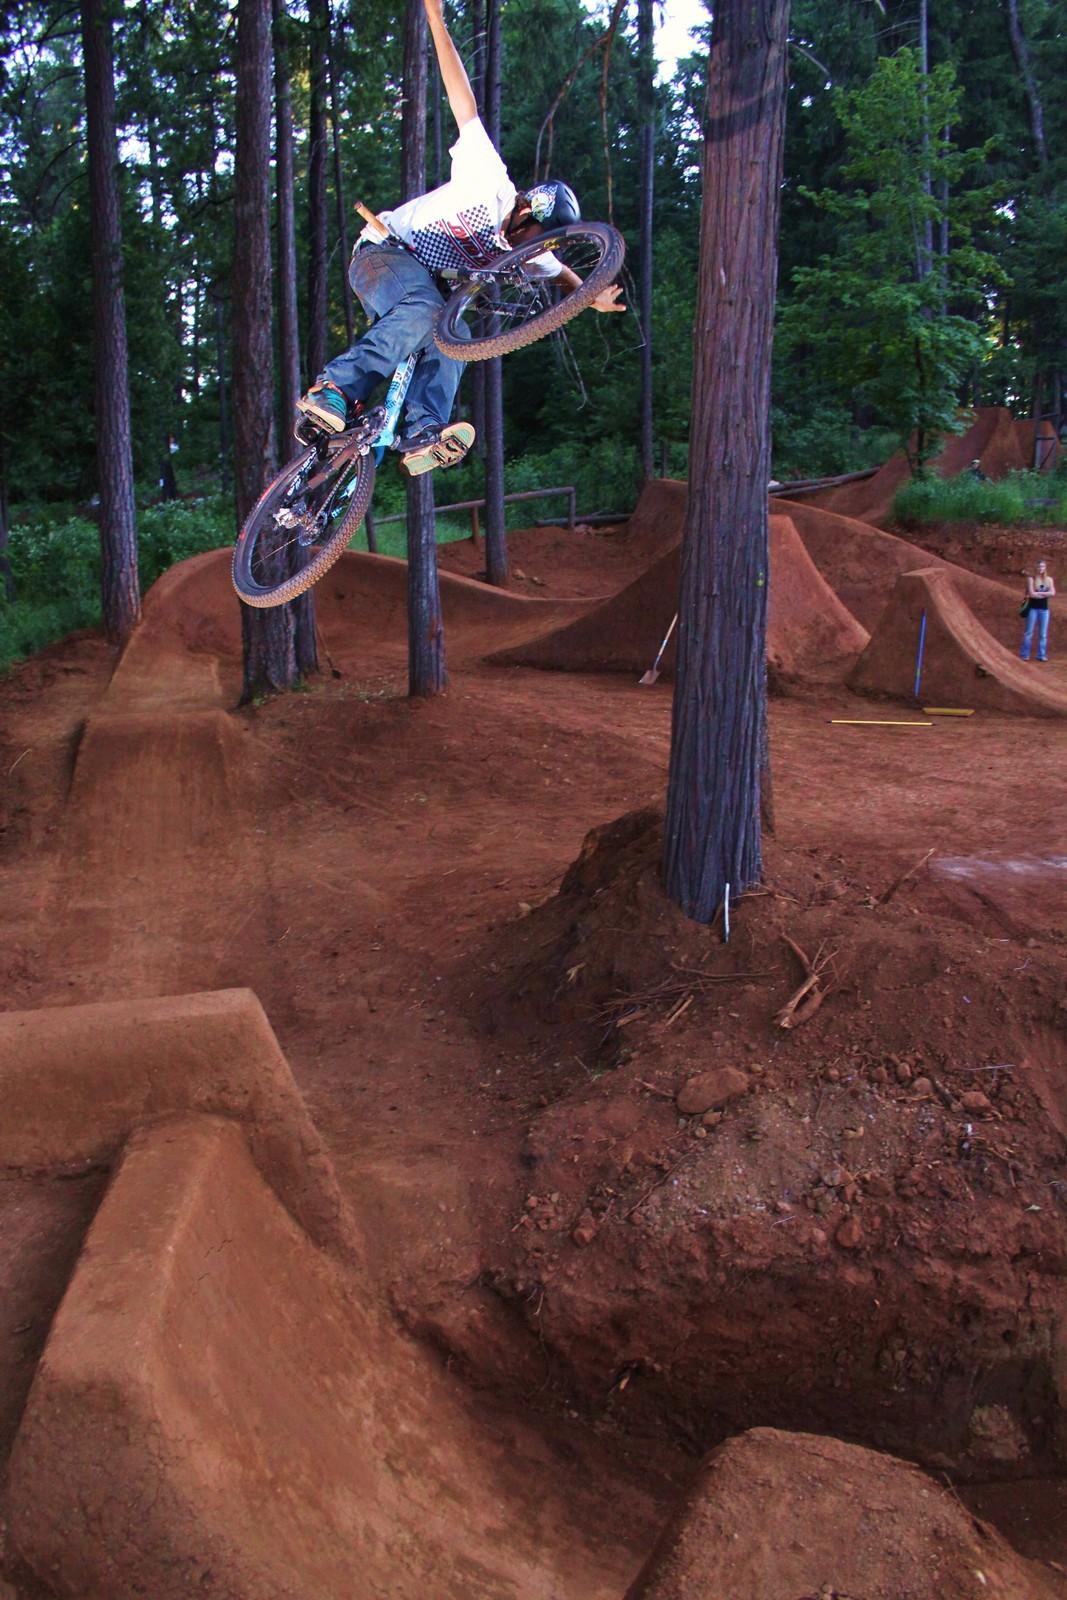 054 - ZD - Mountain Biking Pictures - Vital MTB